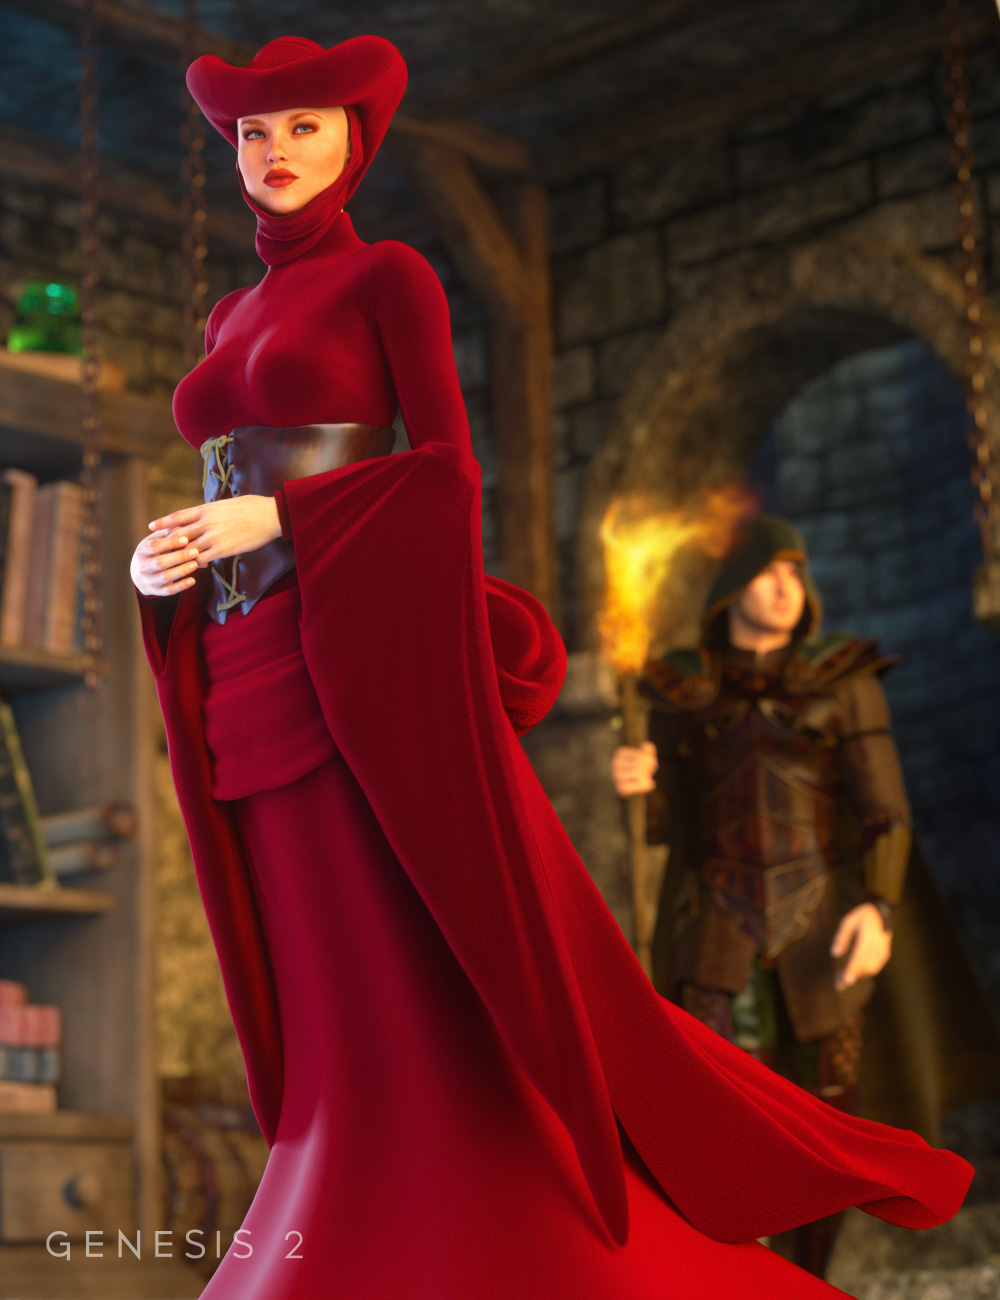 Morphing Fantasy Dress Exp 2 for Genesis 2 Female(s) by: Ravenhair, 3D Models by Daz 3D